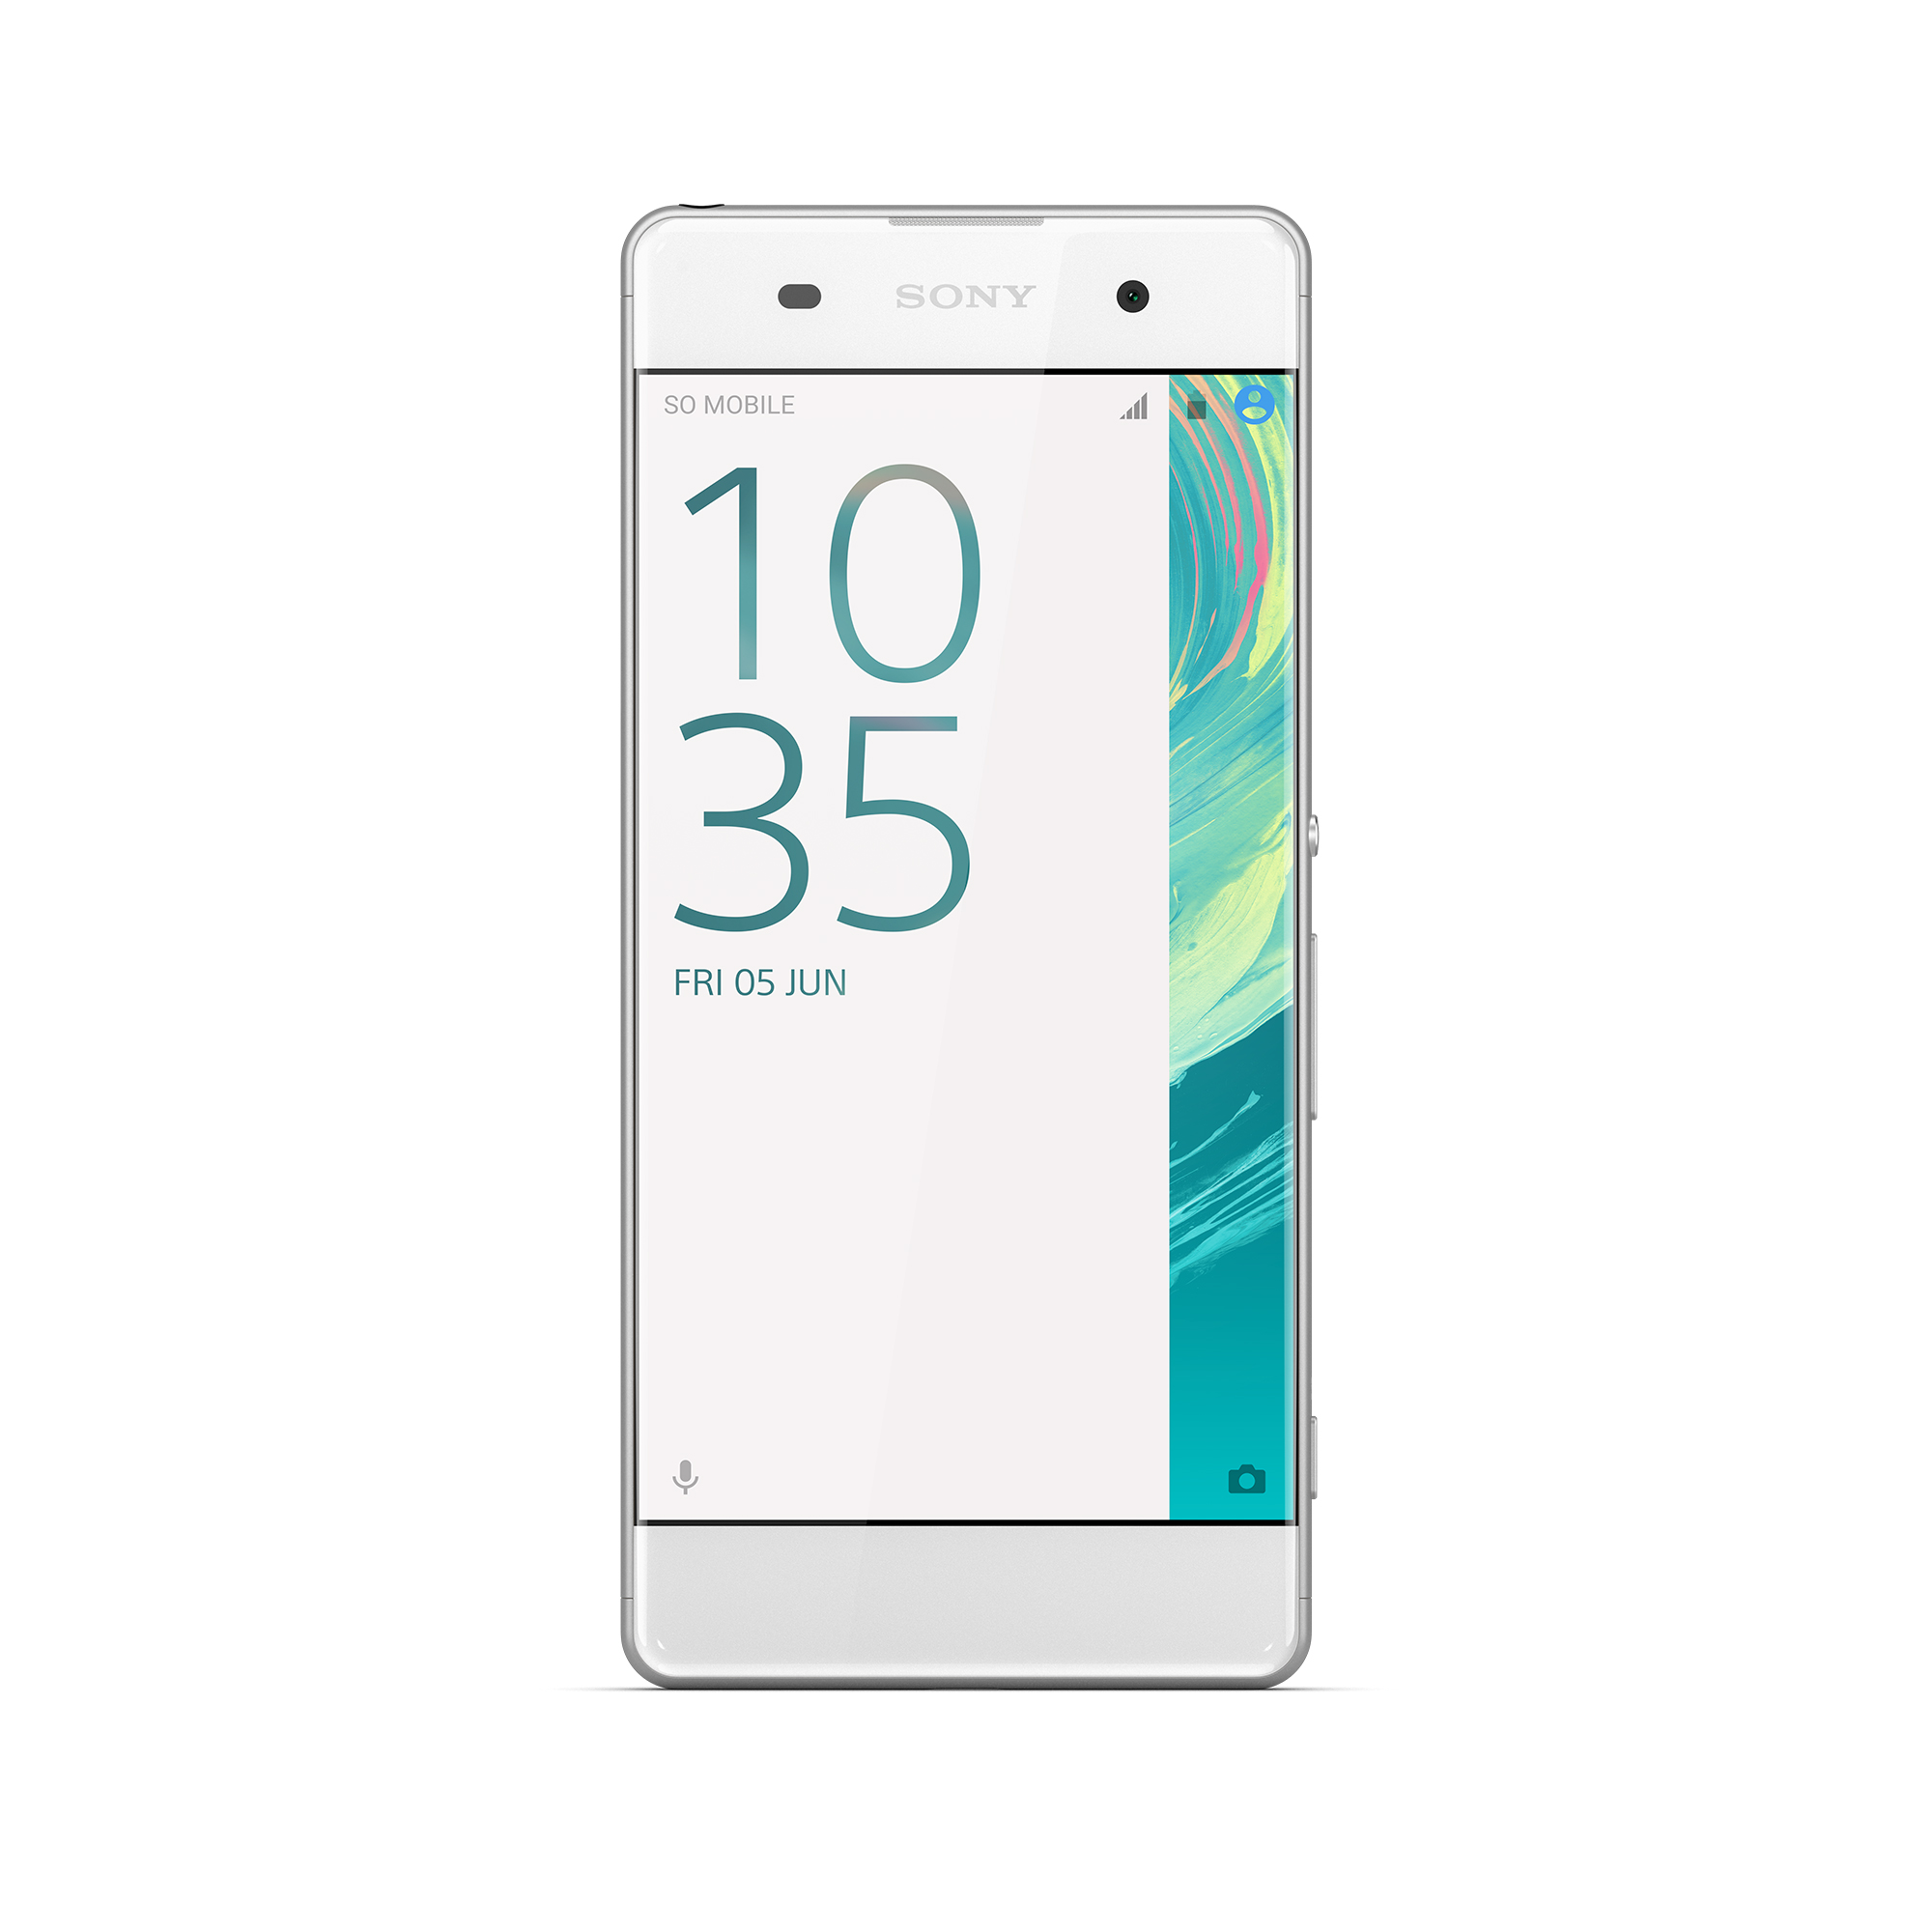 Sony Xperia XA Dual [26,510.00 tk] : Price - Bangladesh